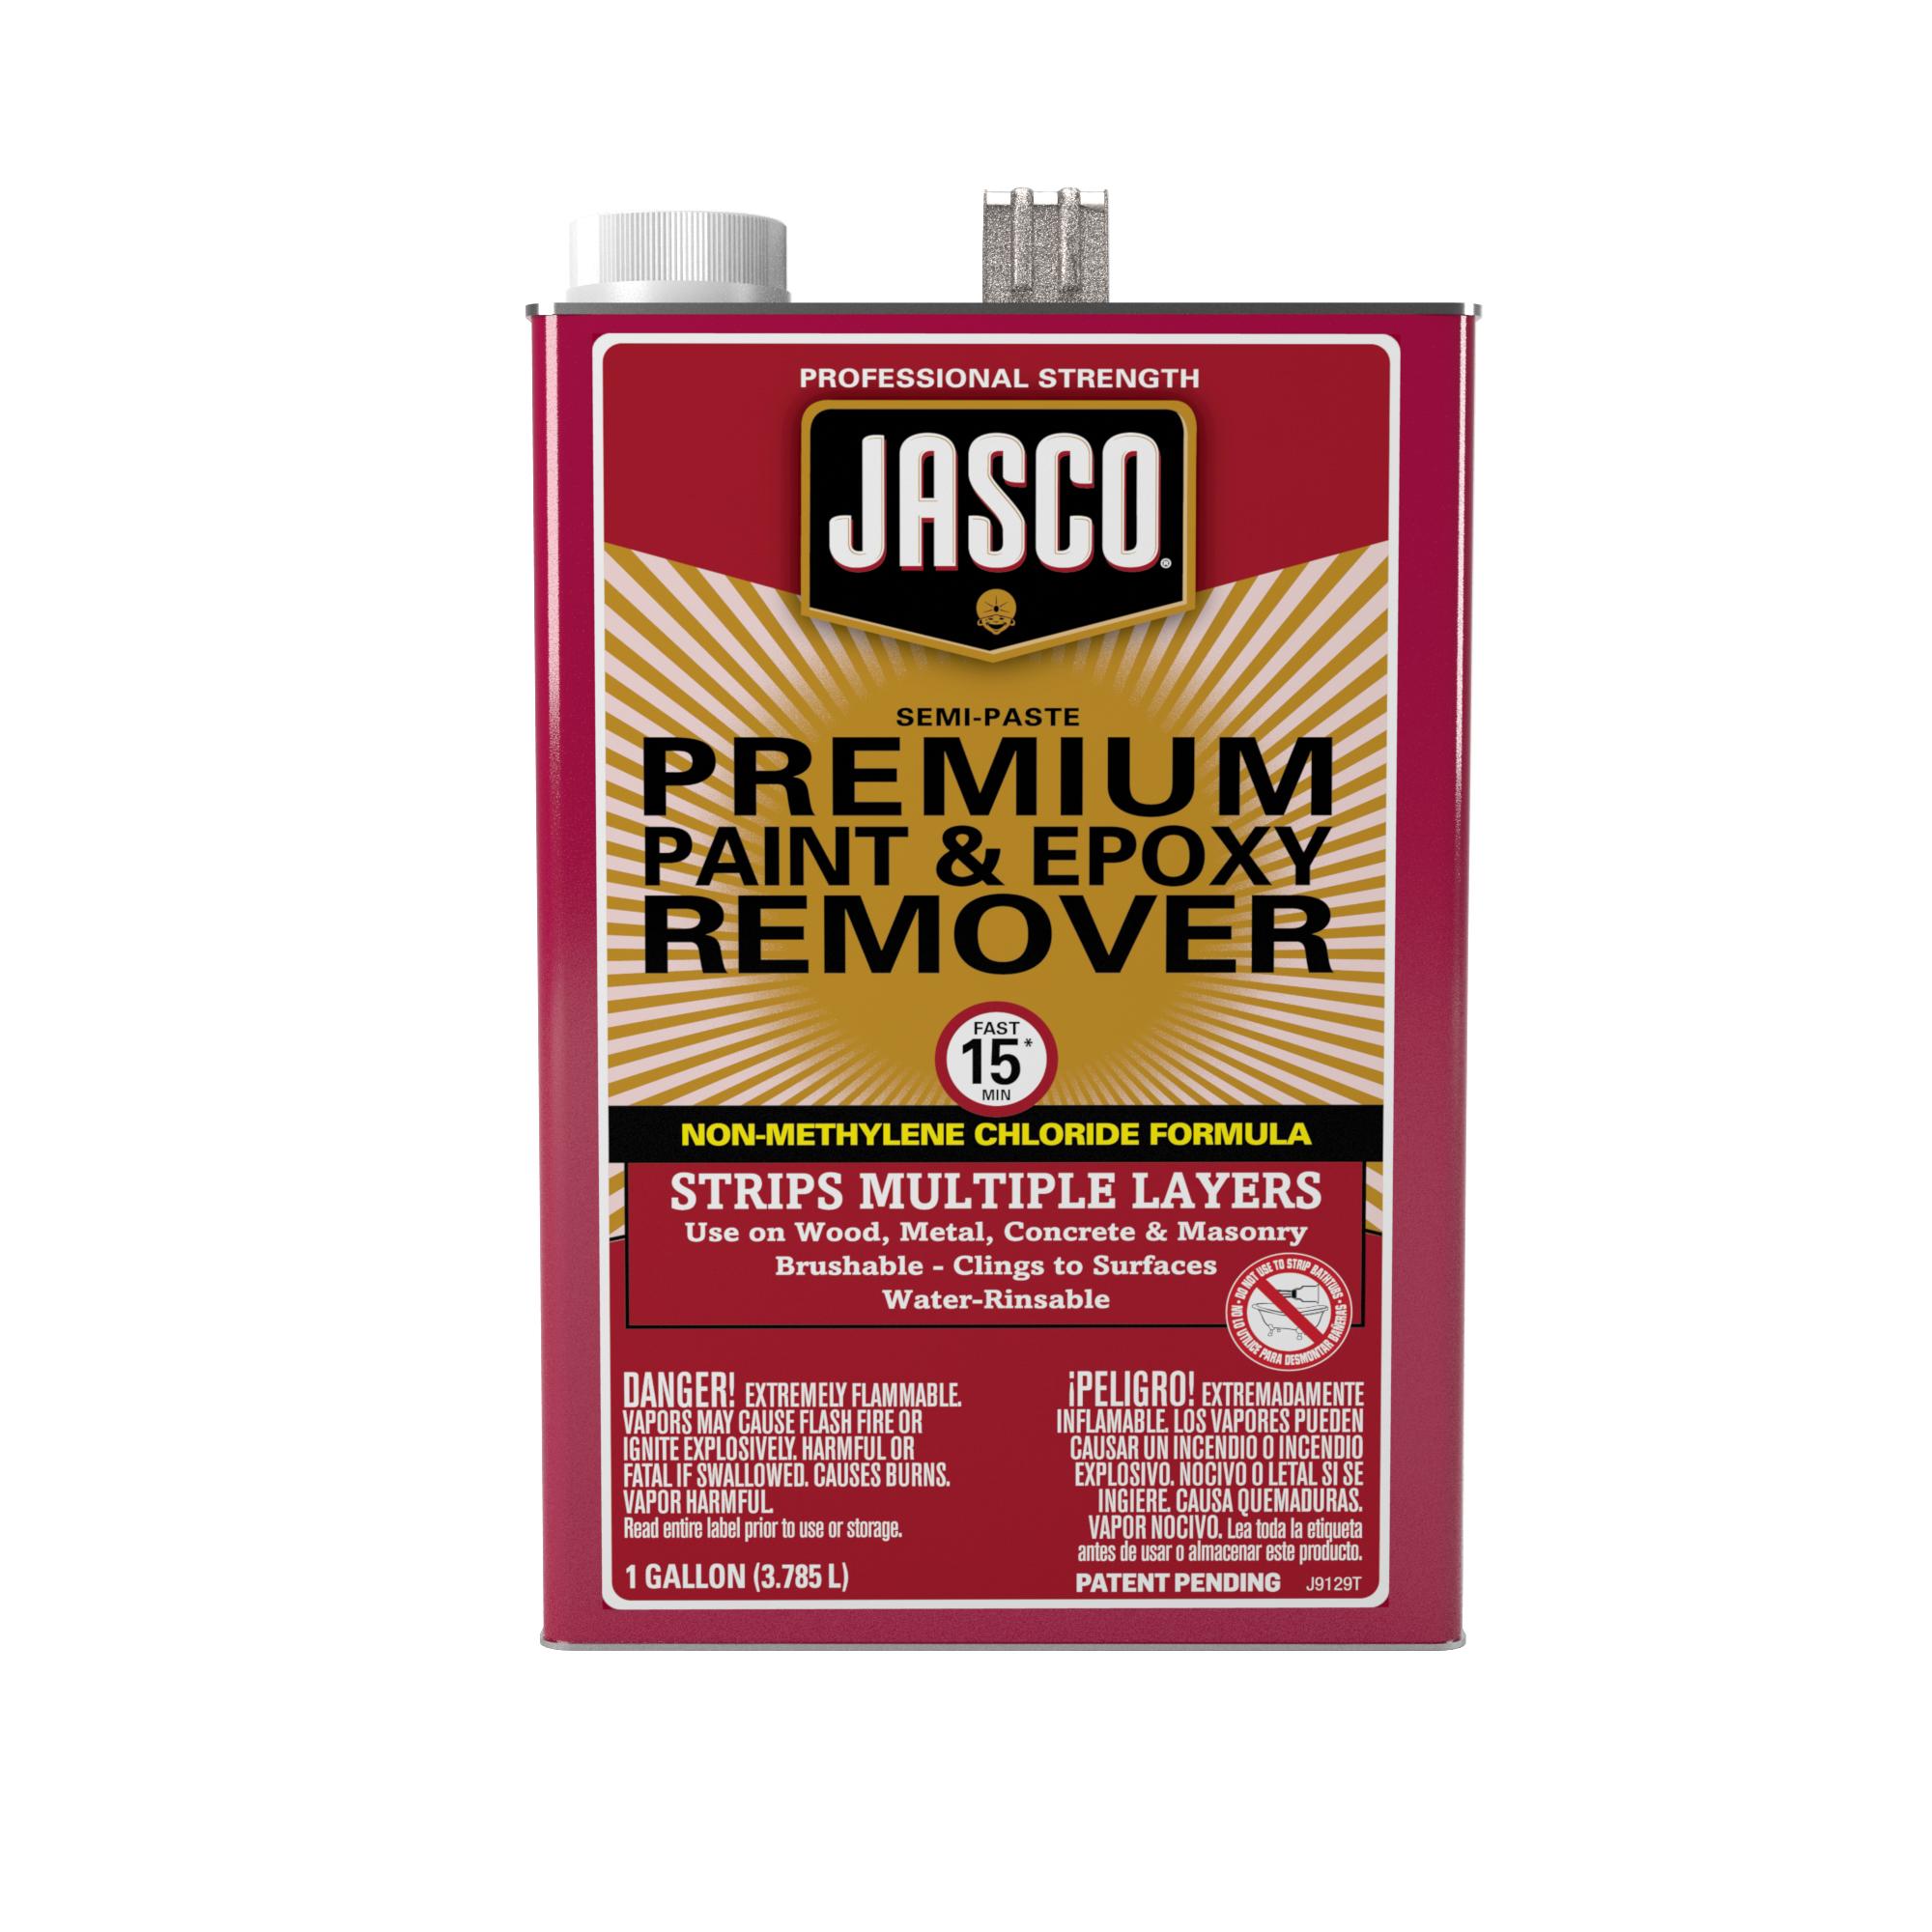 Premium Paint & Epoxy Remover California